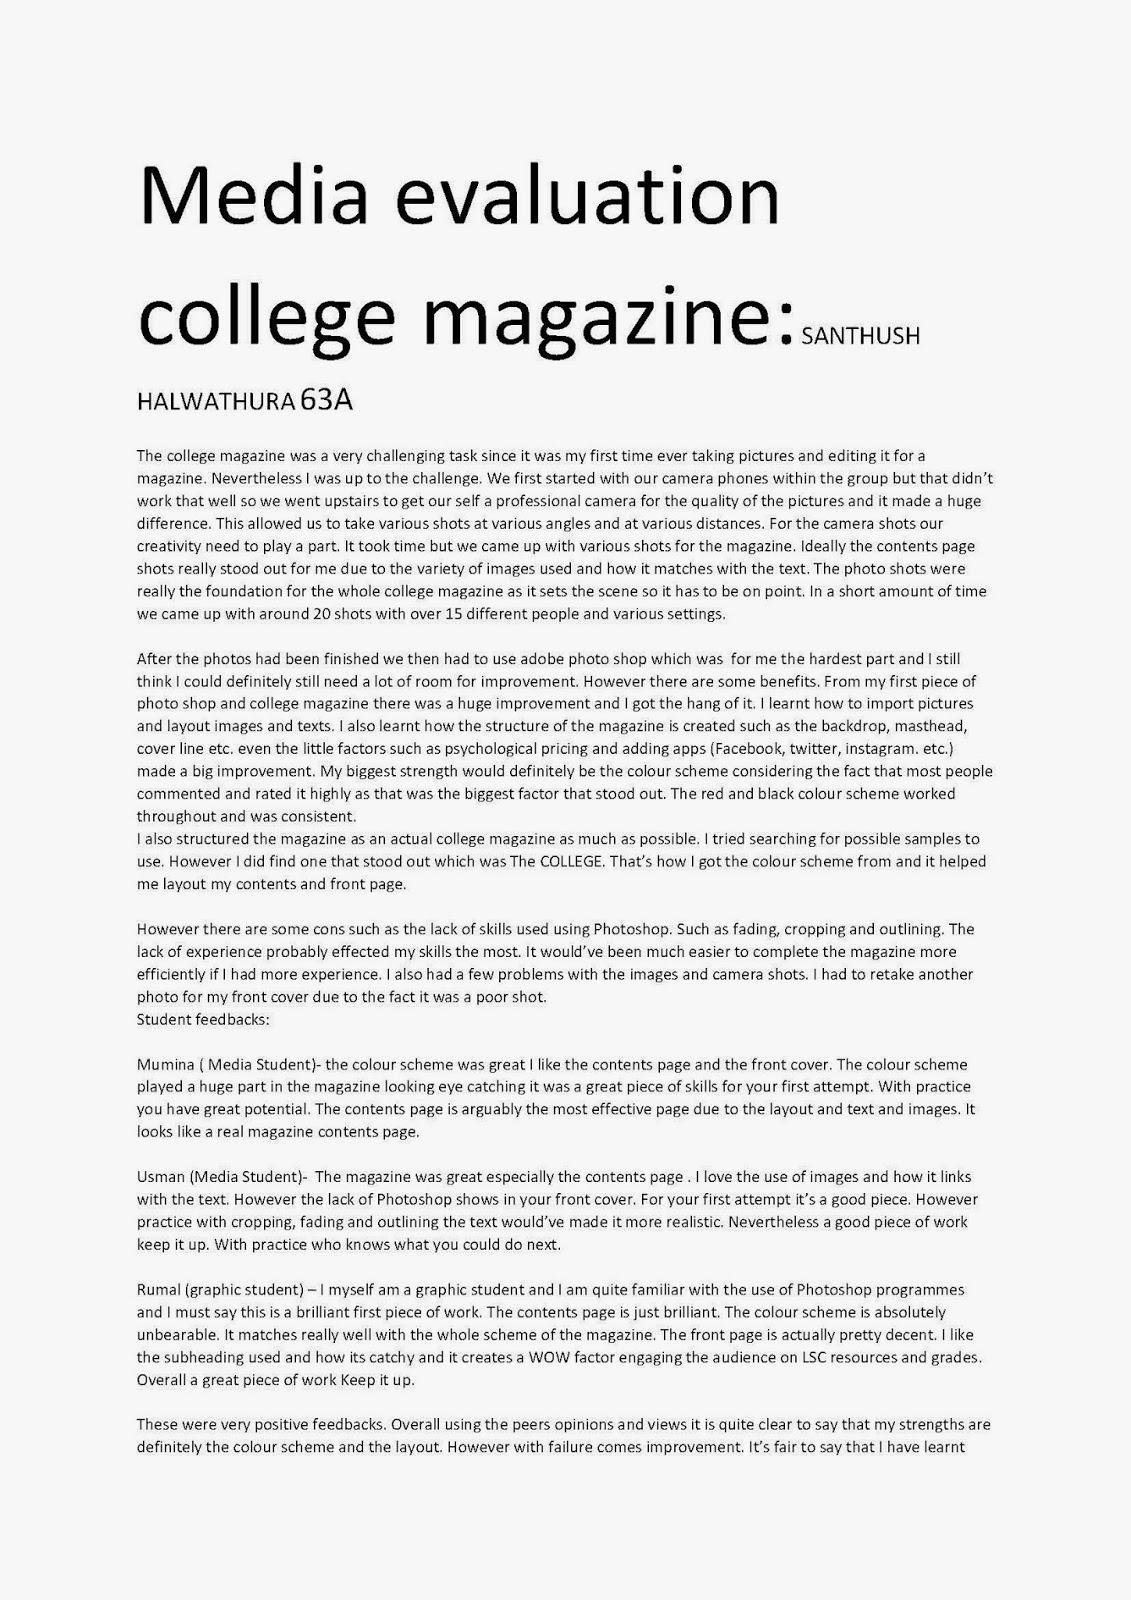 012 Evaluation Argument Essay Example Mediaevaluationcollegemagazine Page 1 Shocking Full